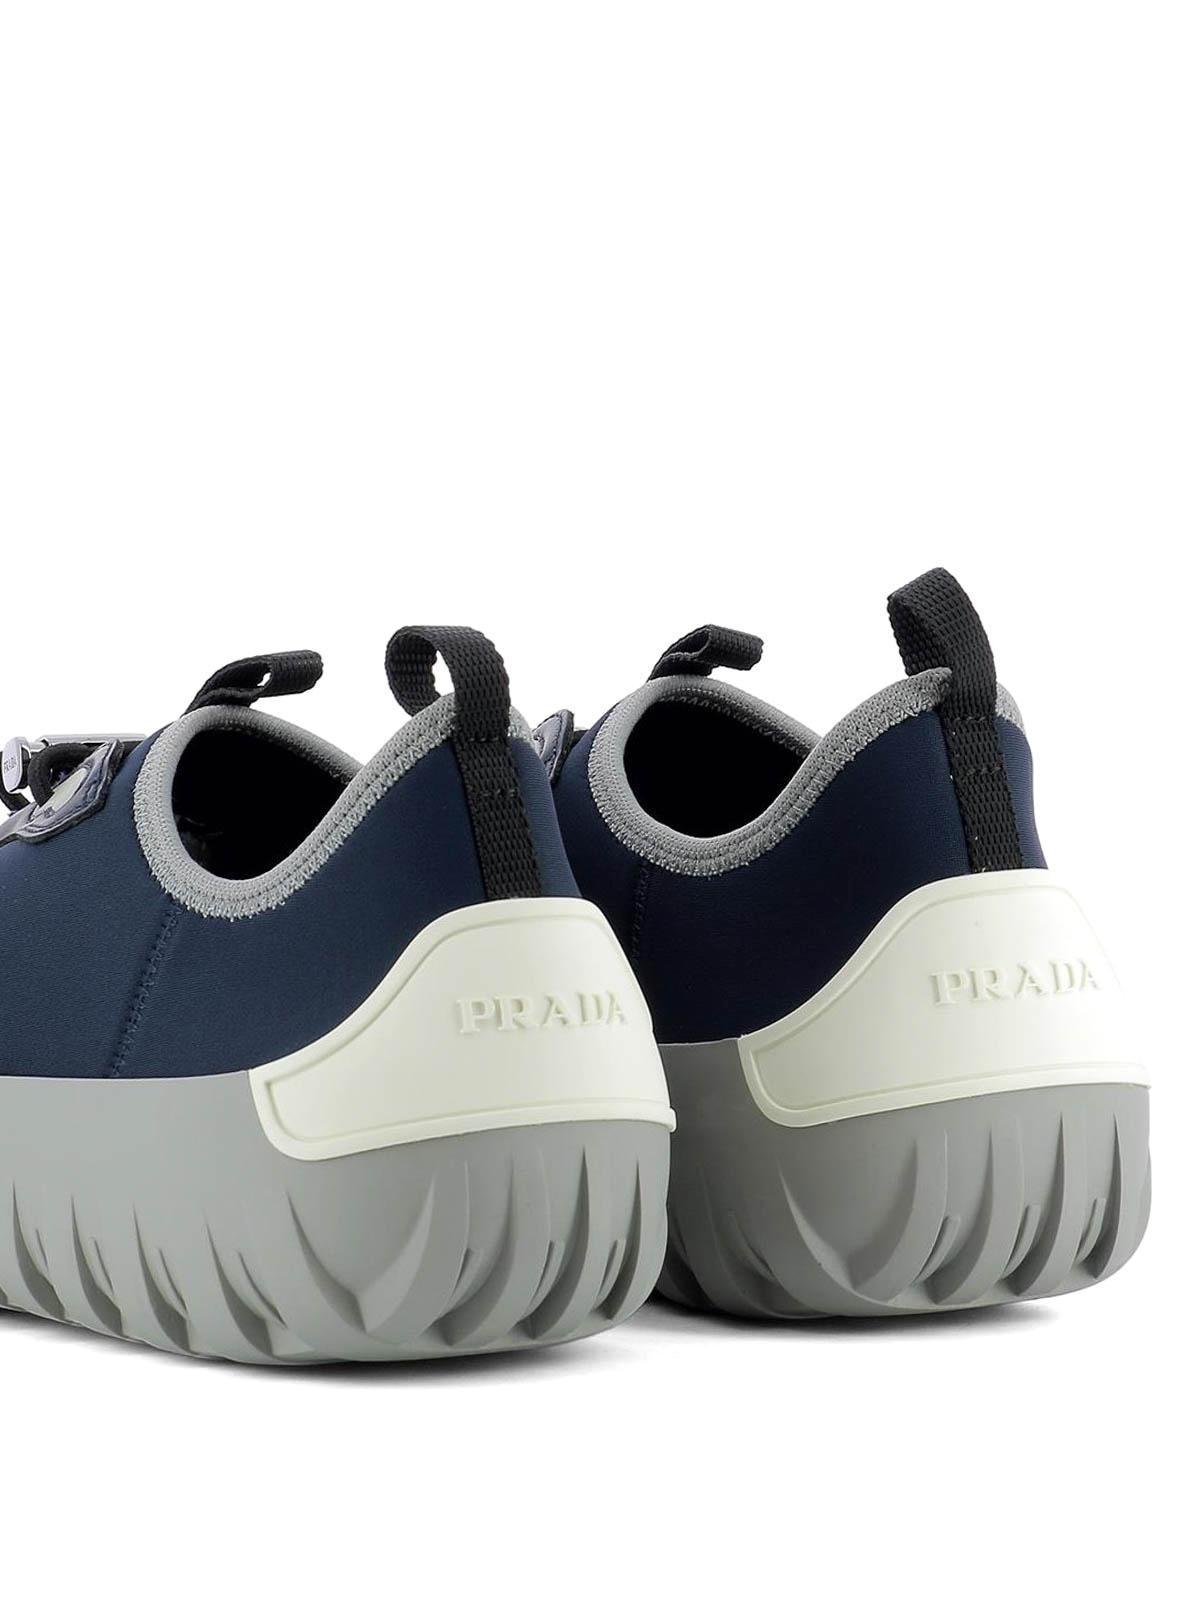 Sock style blue neoprene sneakers